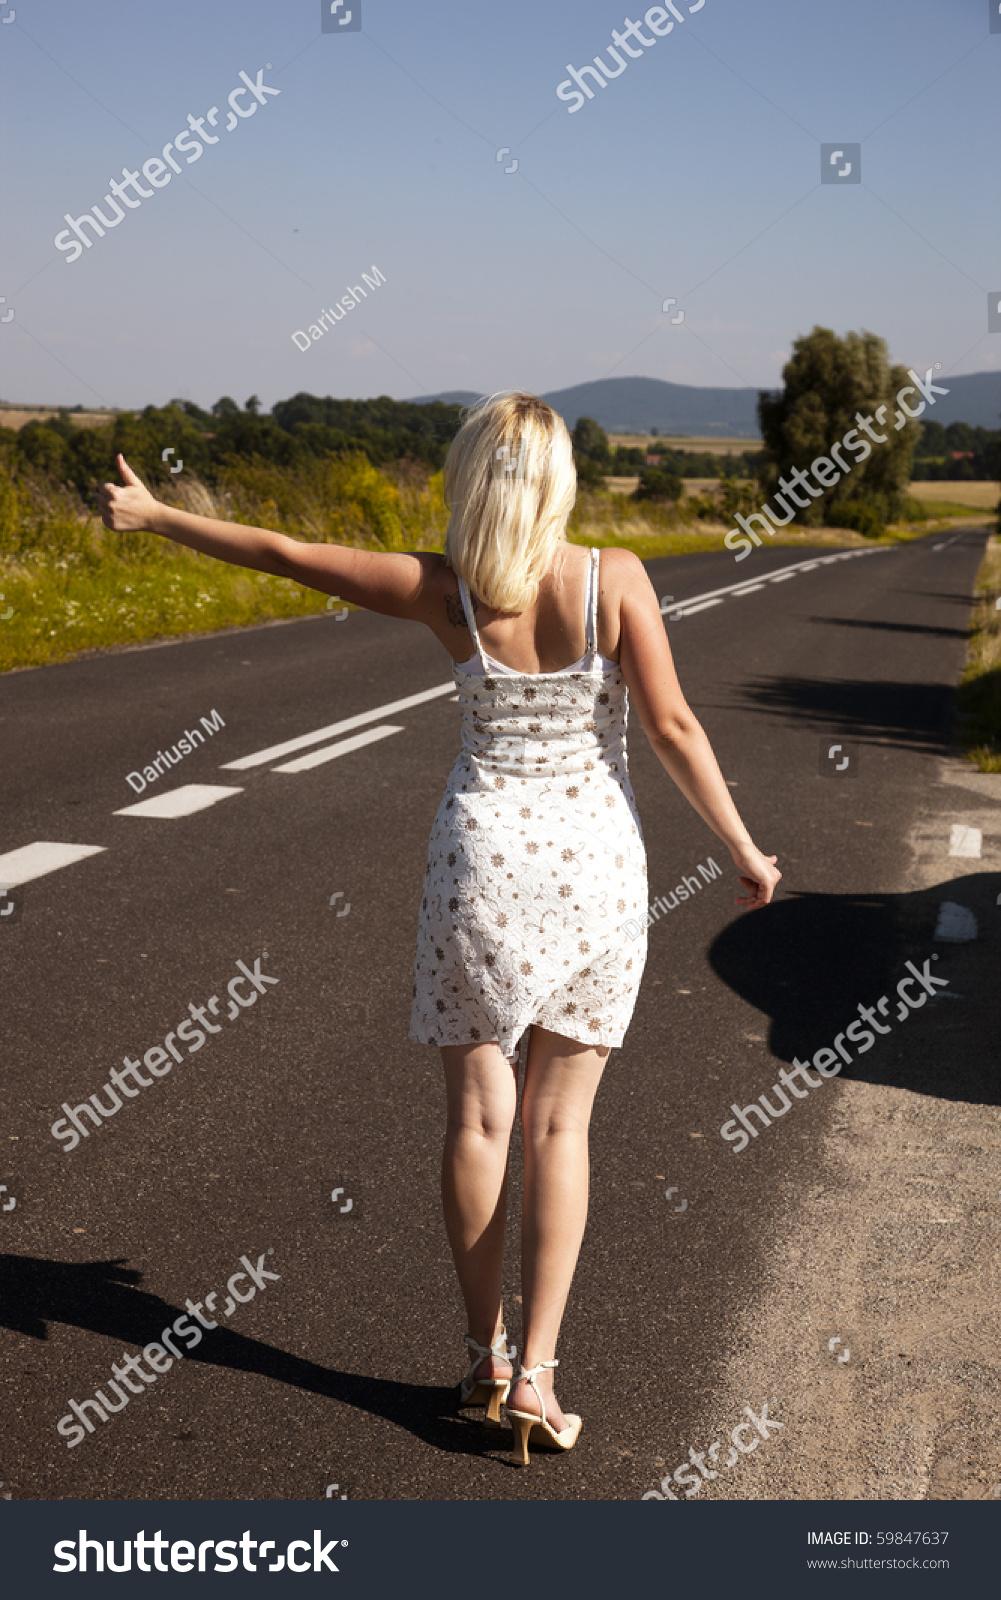 Hitchhiker sex